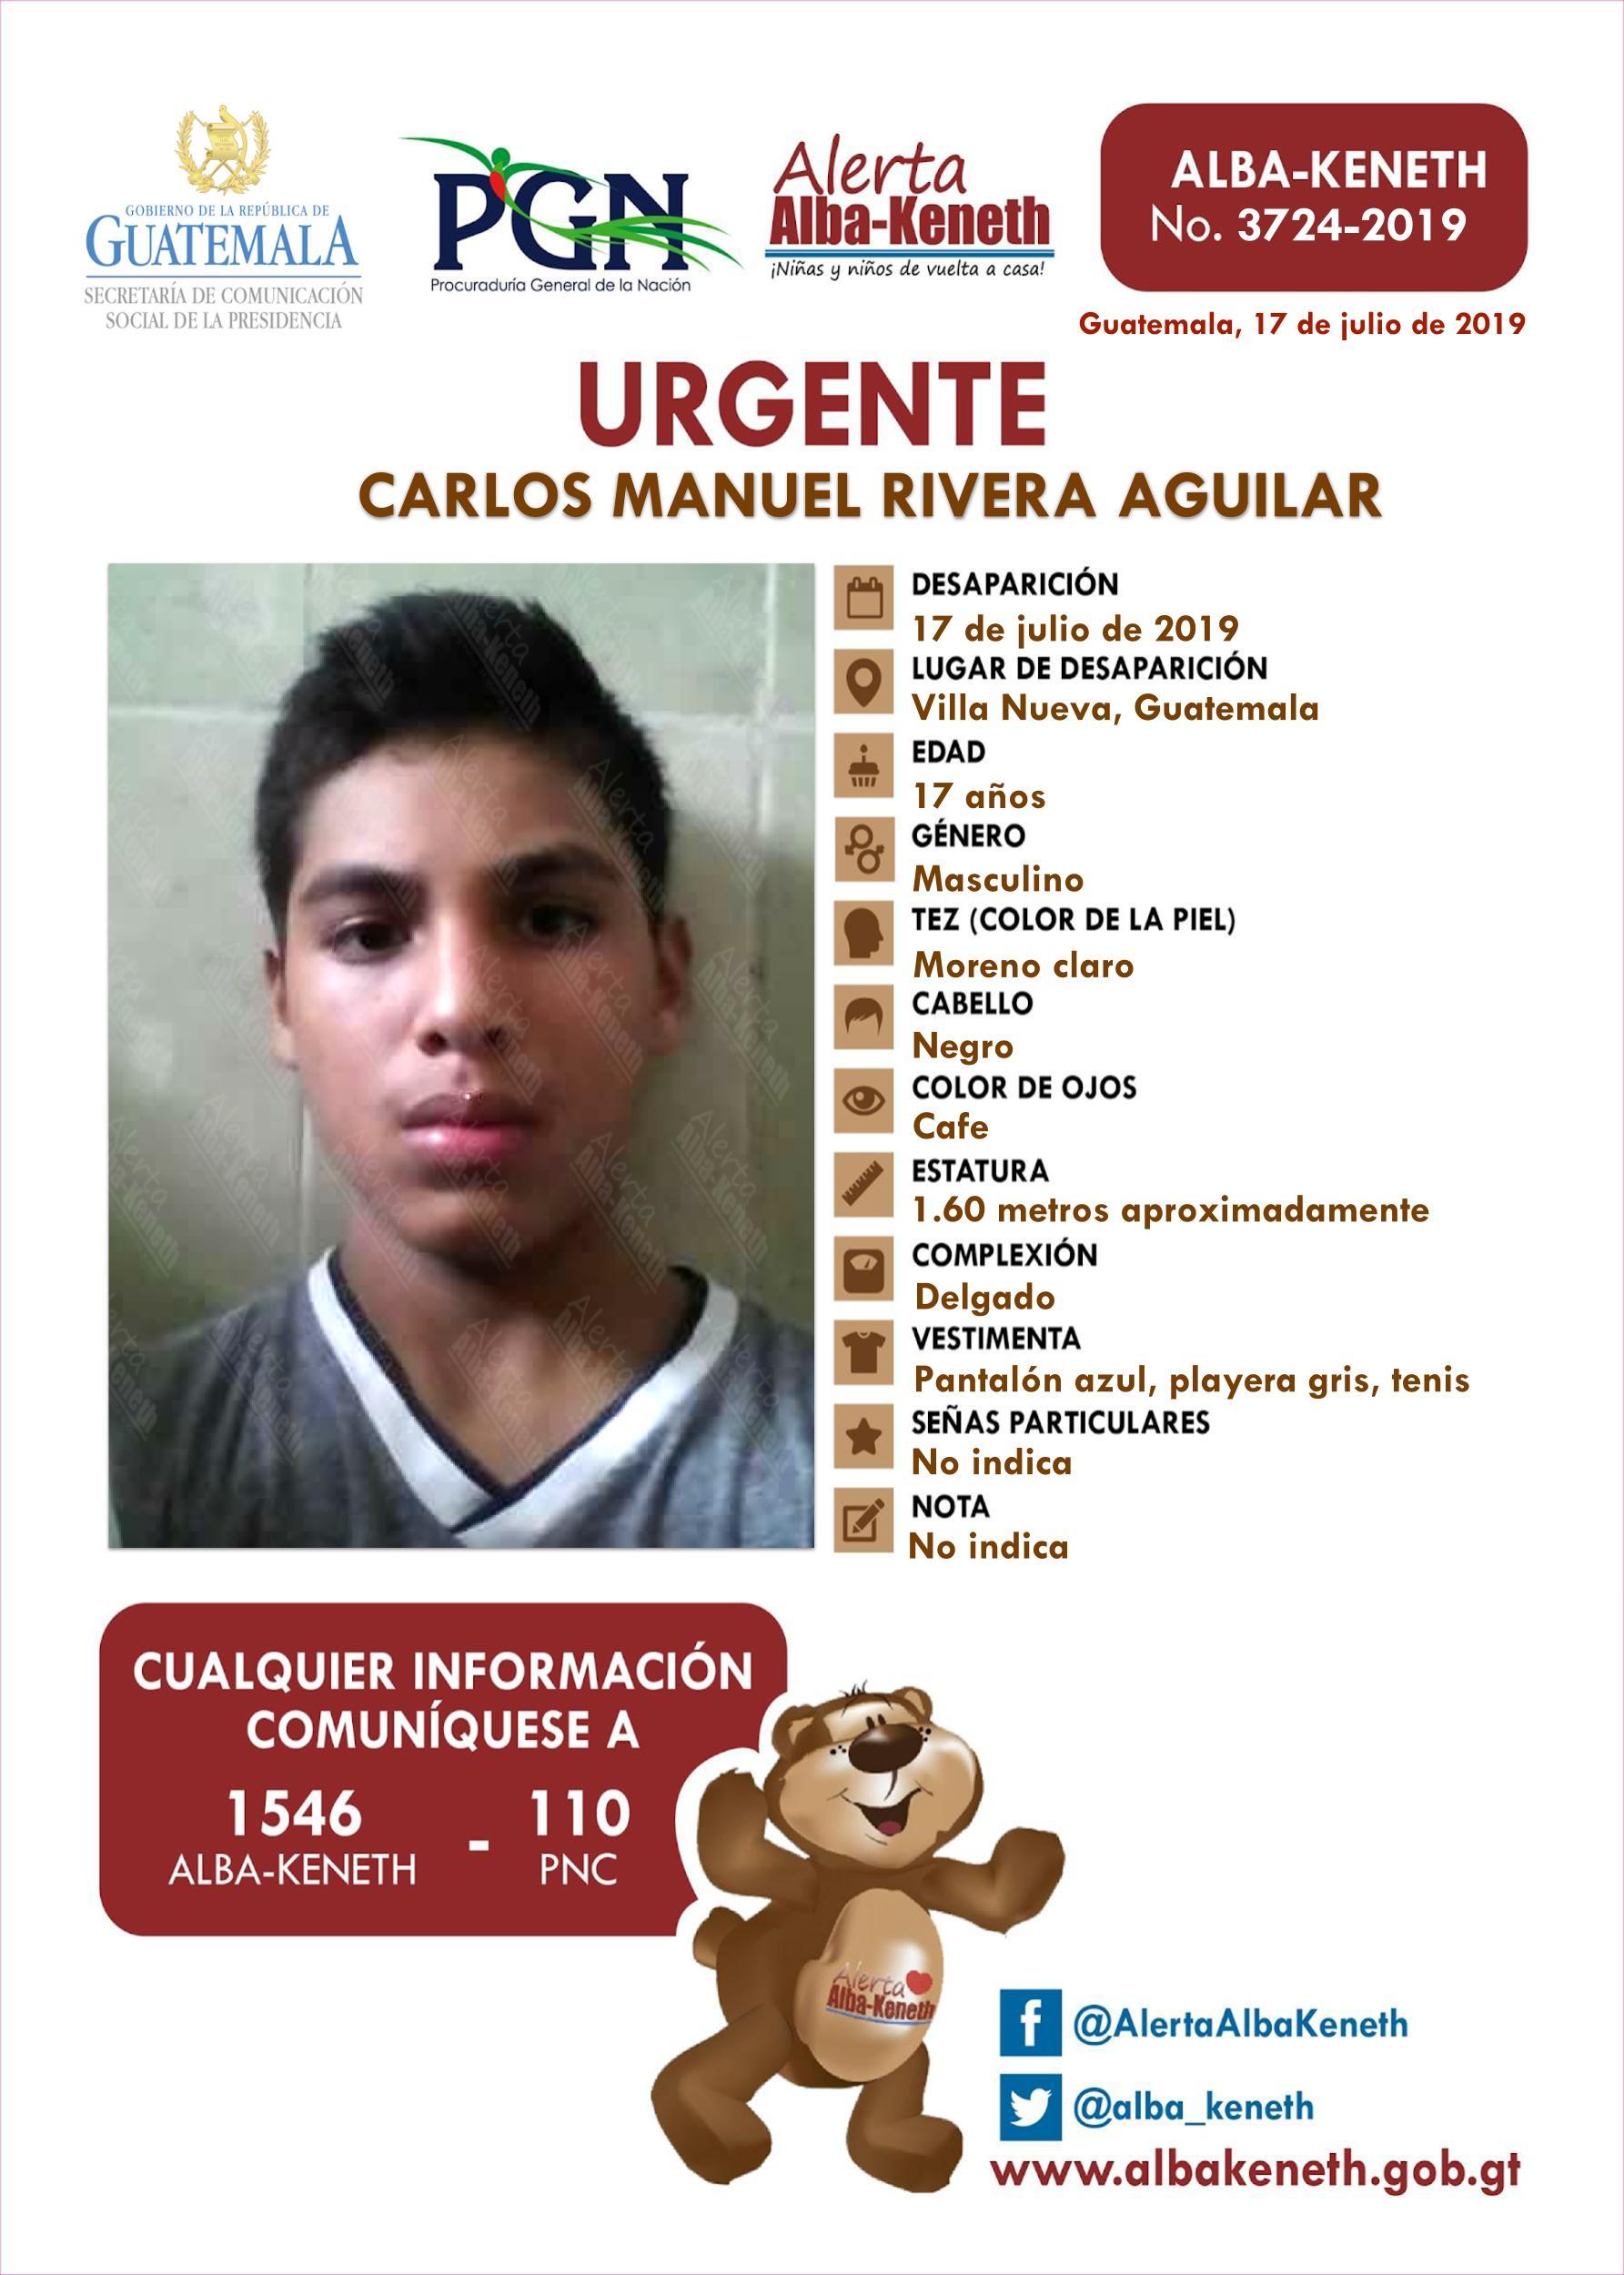 Carlos Manuel Rivera Aguilar